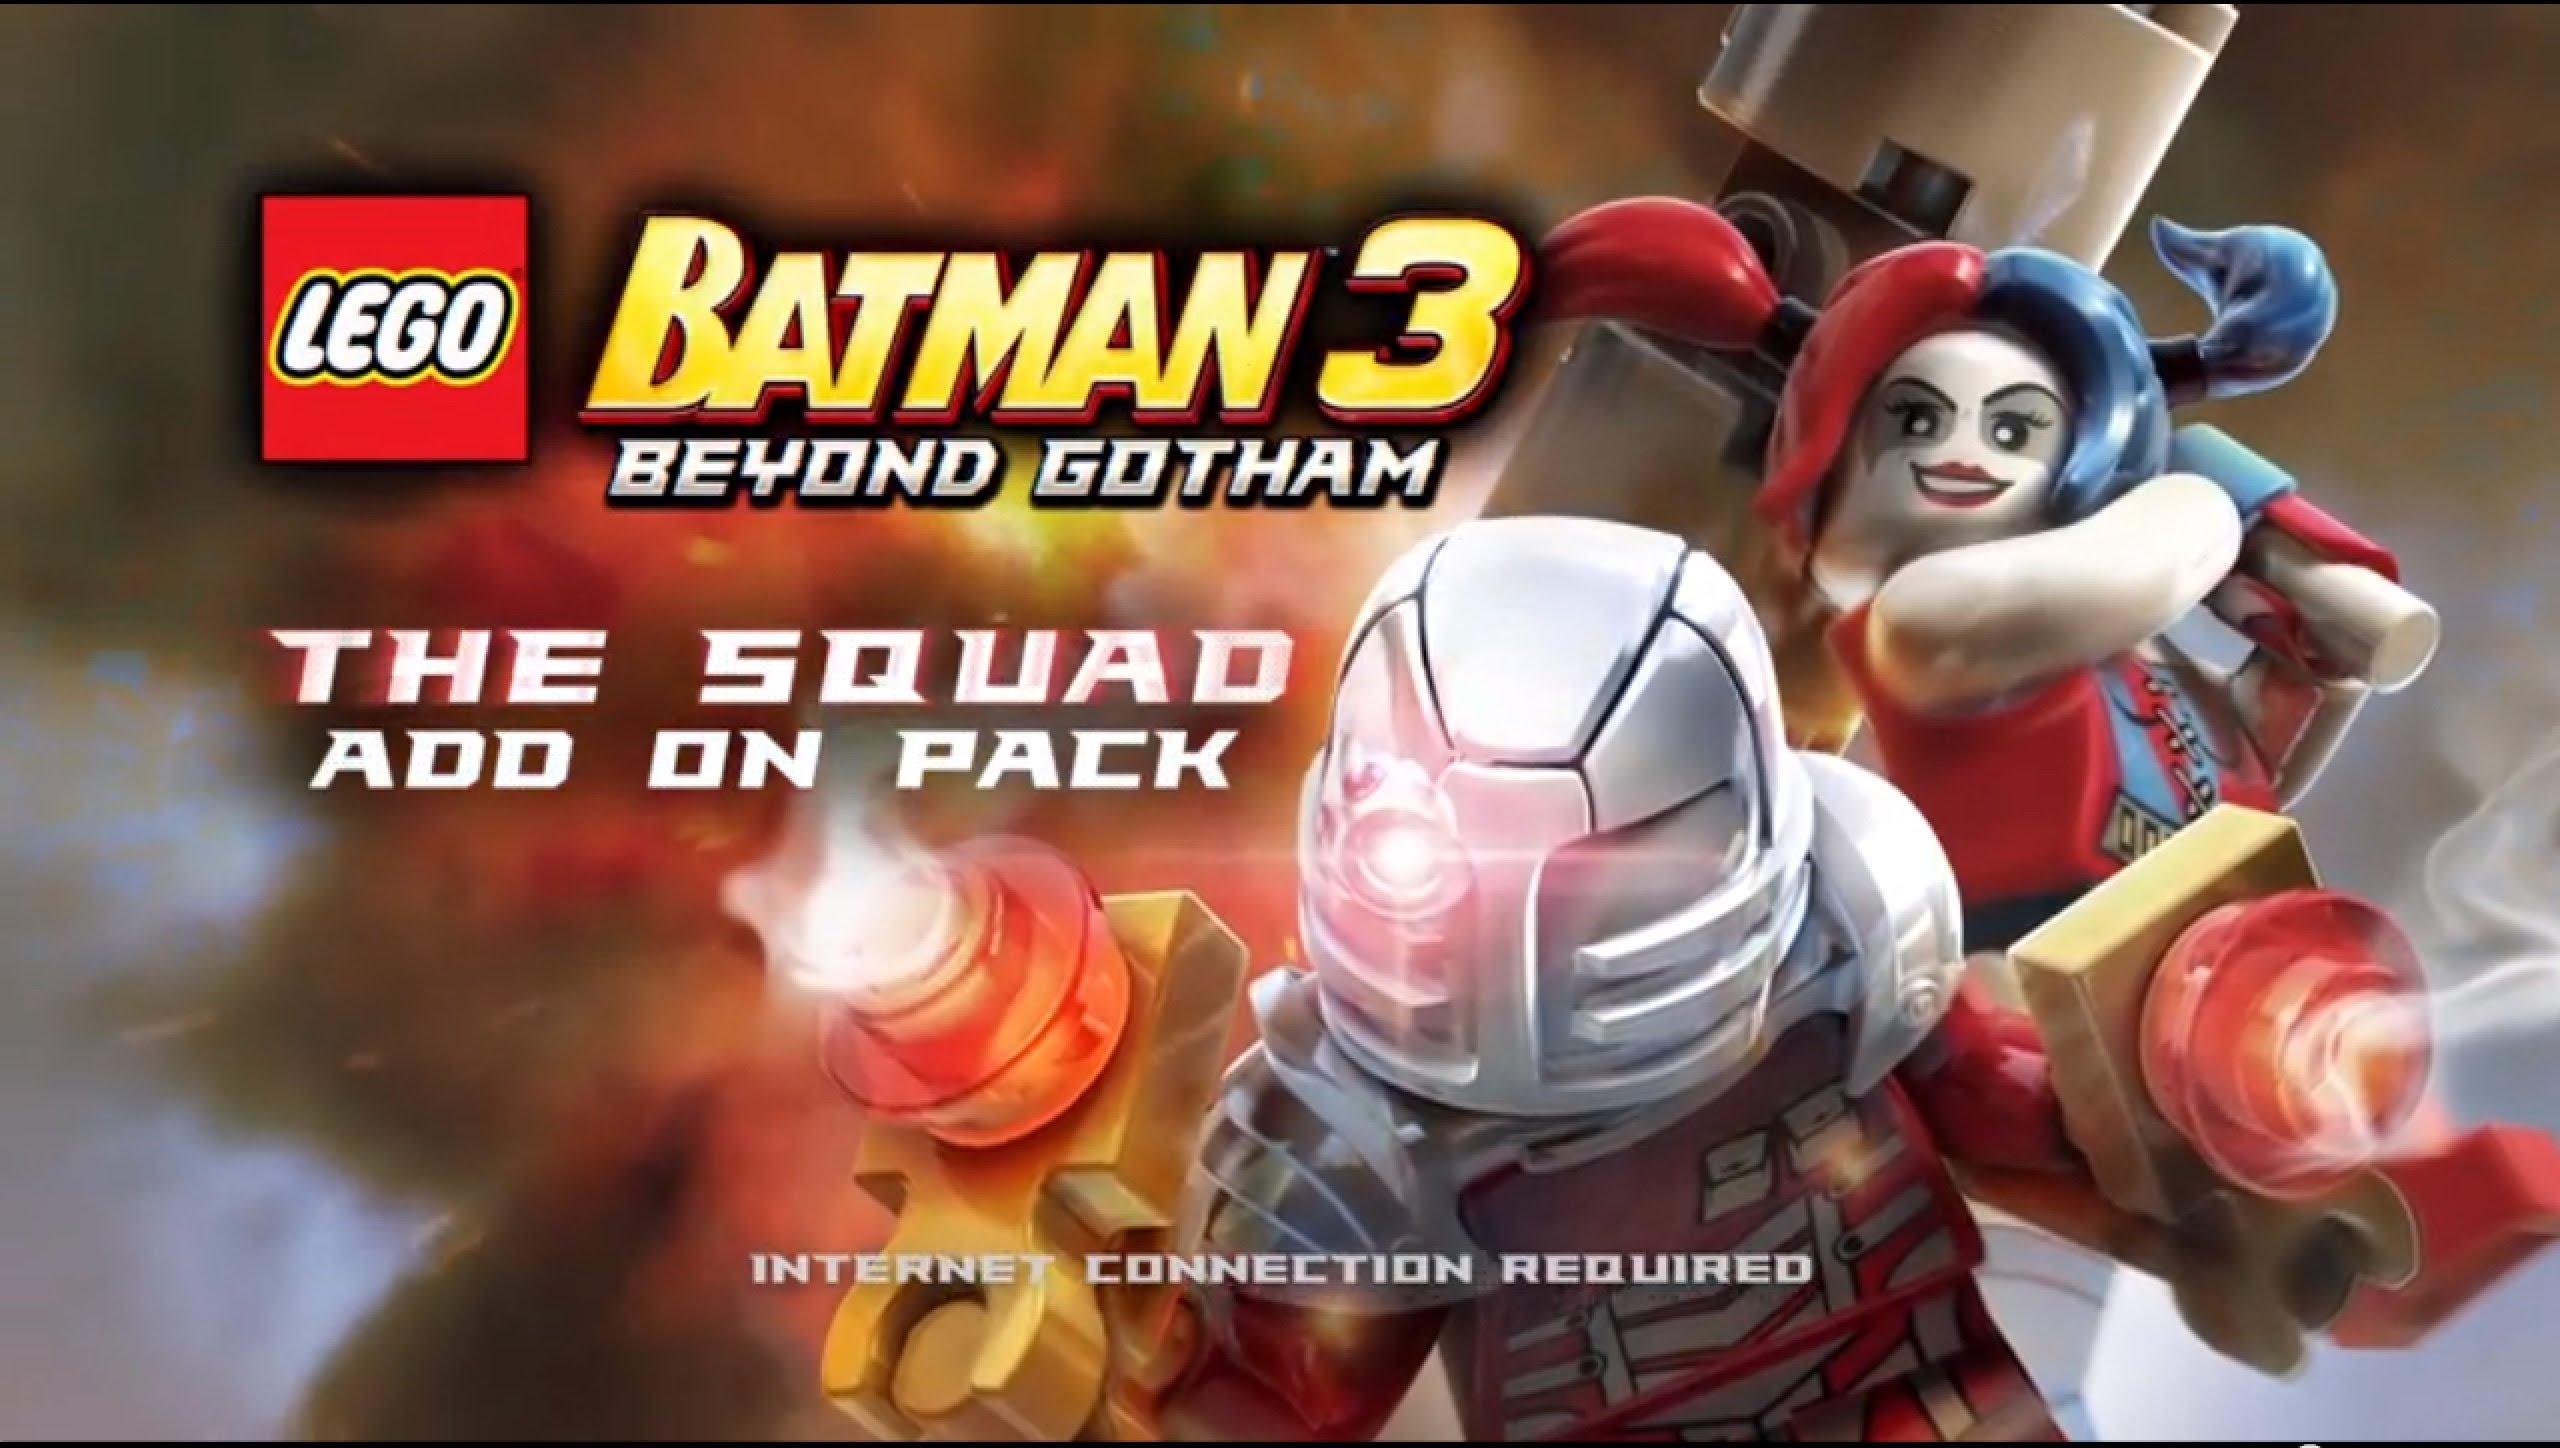 Suicide Squad DLC pack now available for 'LEGO Batman 3